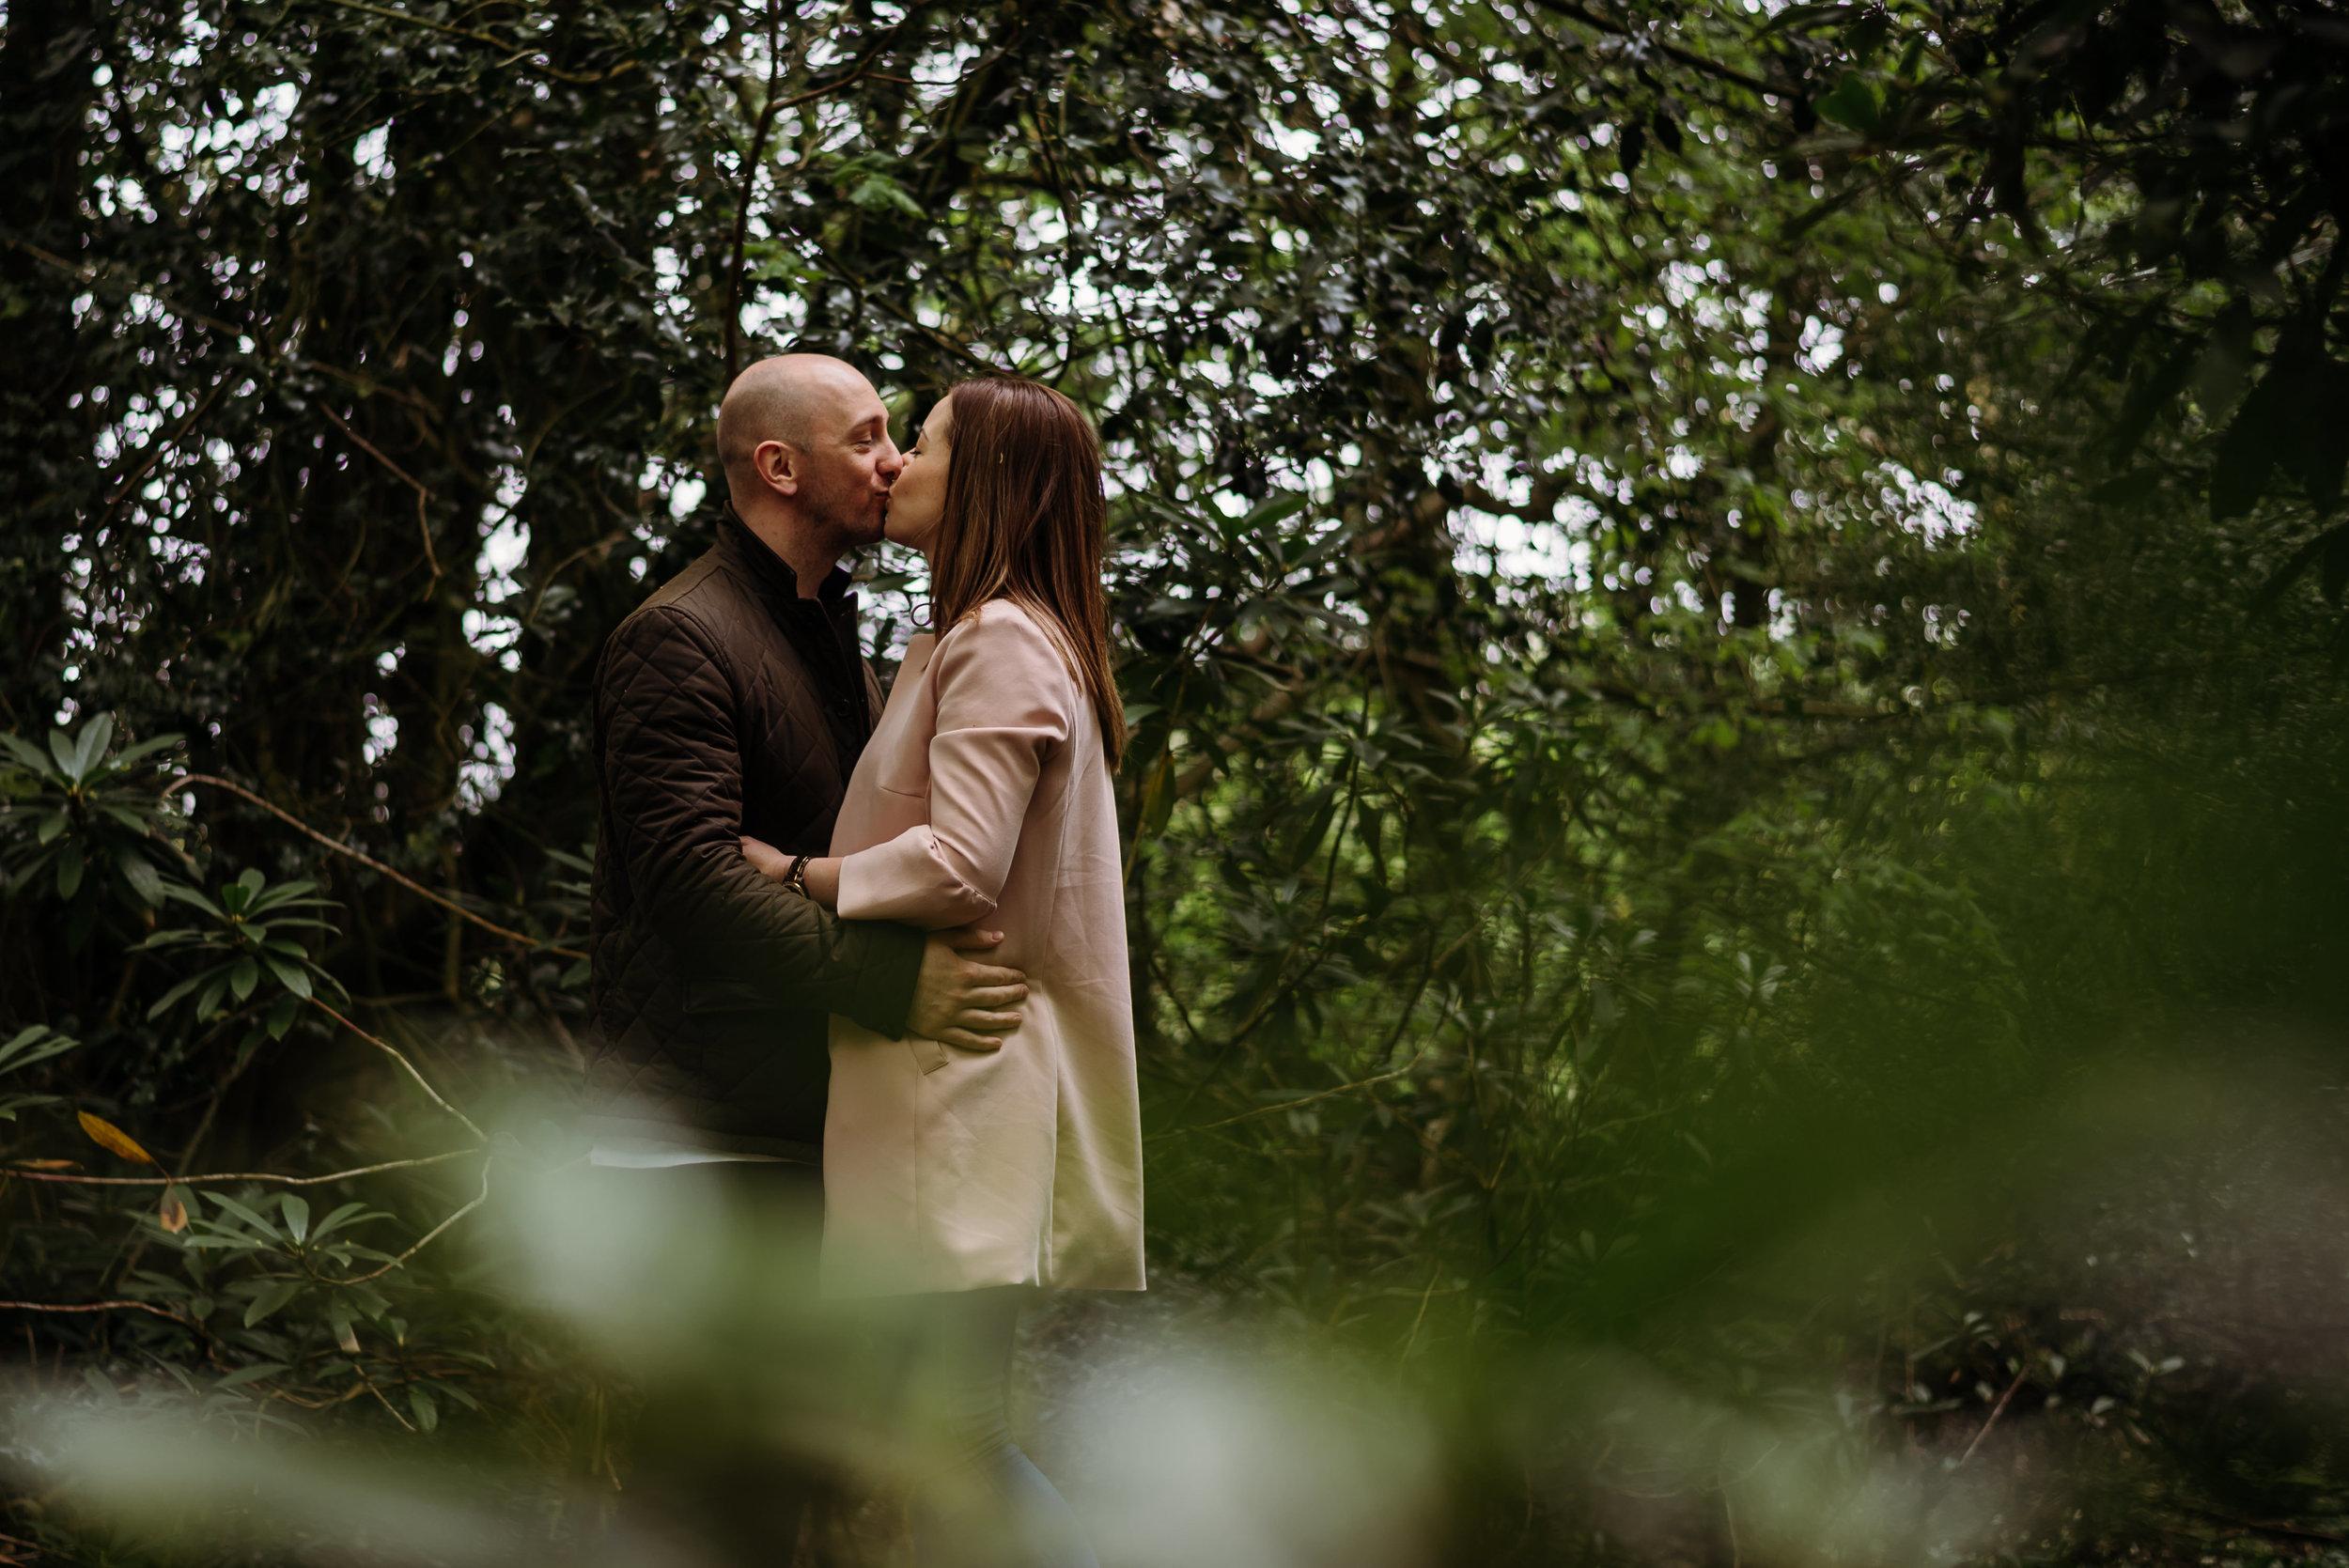 Towneley Hall, Burnley couples photo shoot